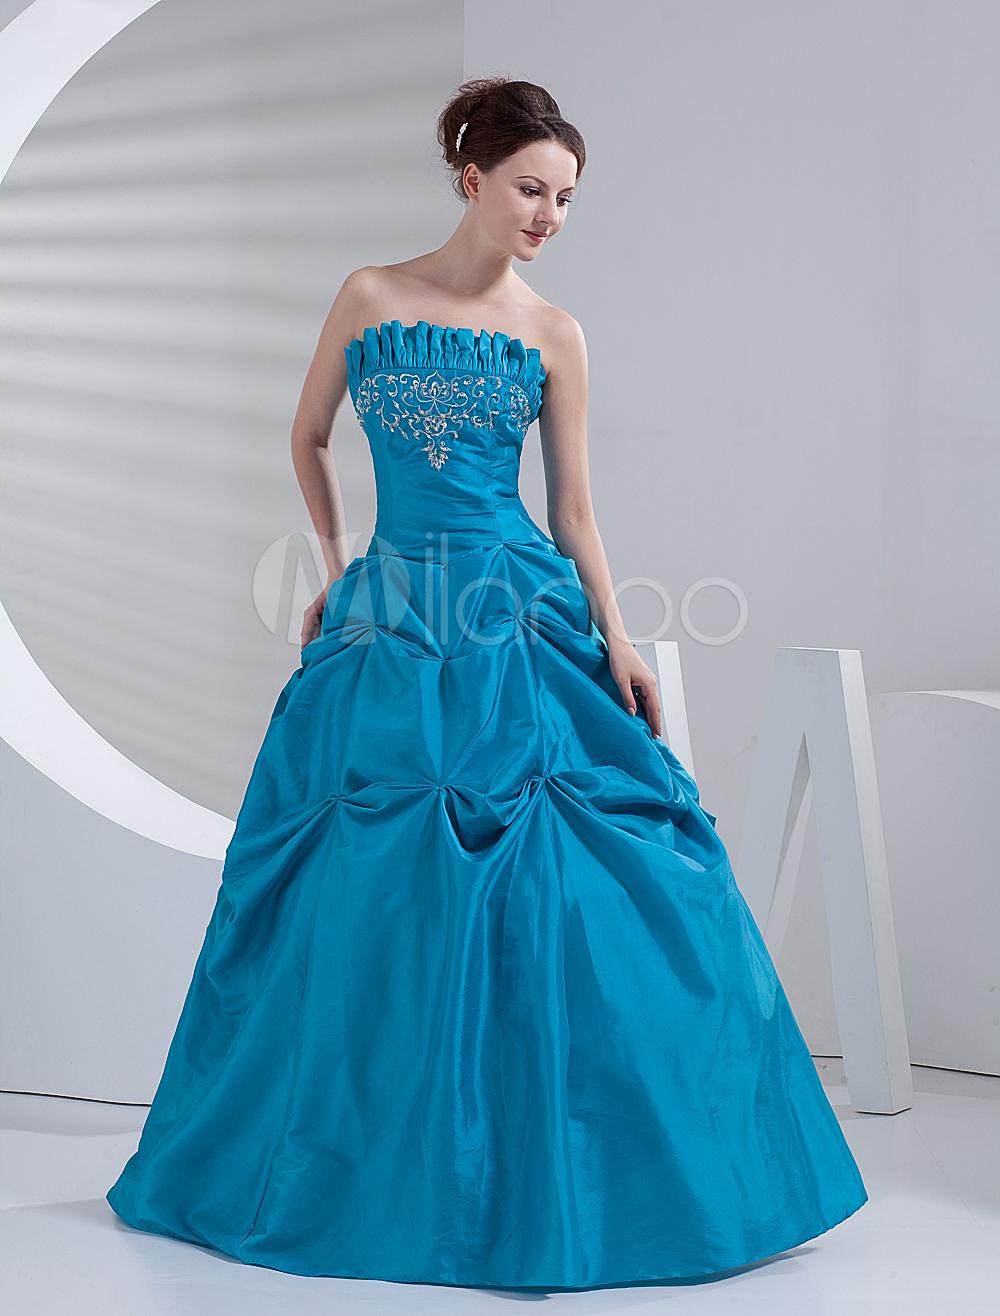 Classic ball gown blue taffeta quinceanera dress clothing